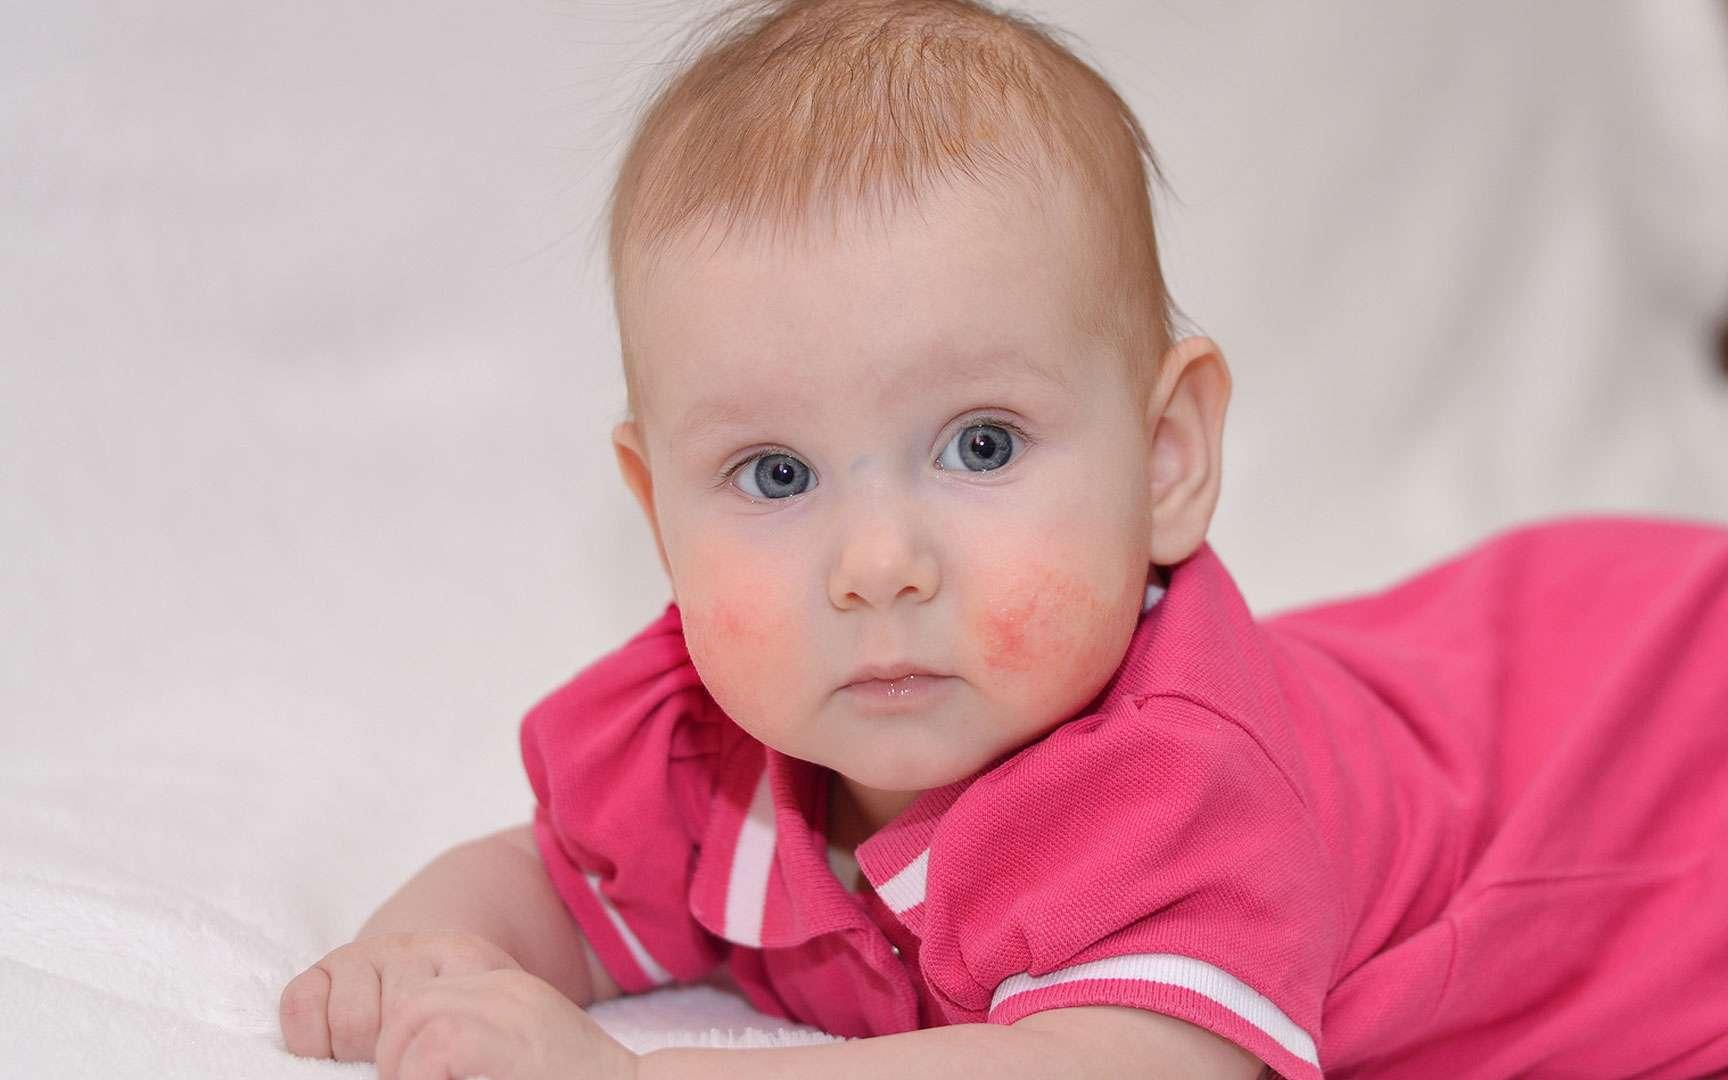 La dermatite atopique, ou eczéma atopique, chez le nourrisson. ©Silentalex88, Fotolia